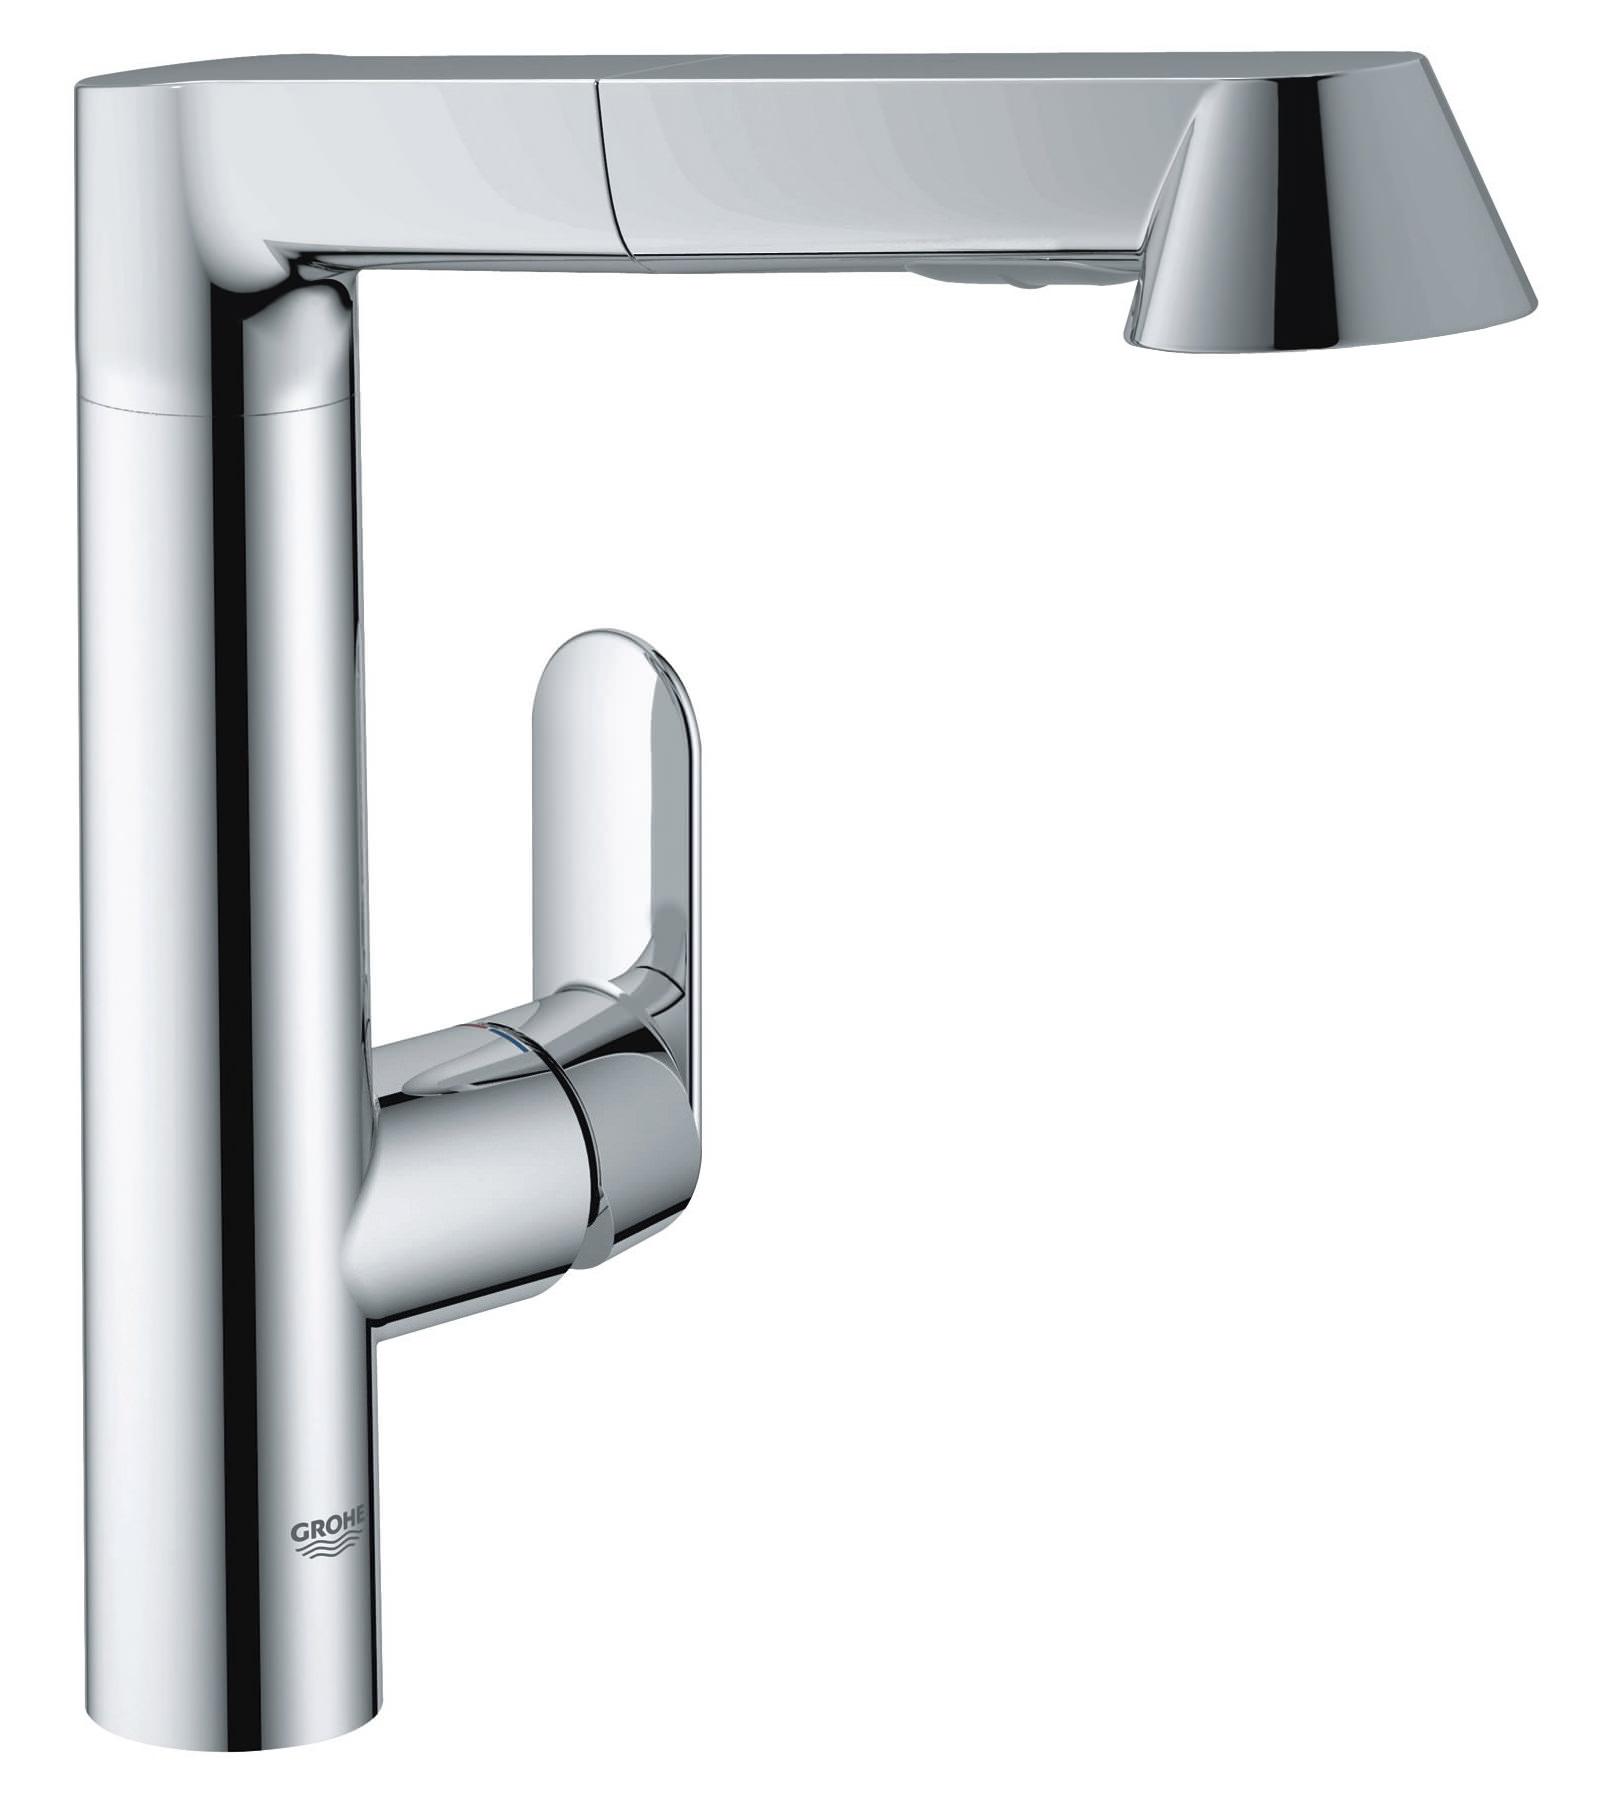 Grohe K7 Monobloc Kitchen Sink Mixer Tap Chrome - 32176 000